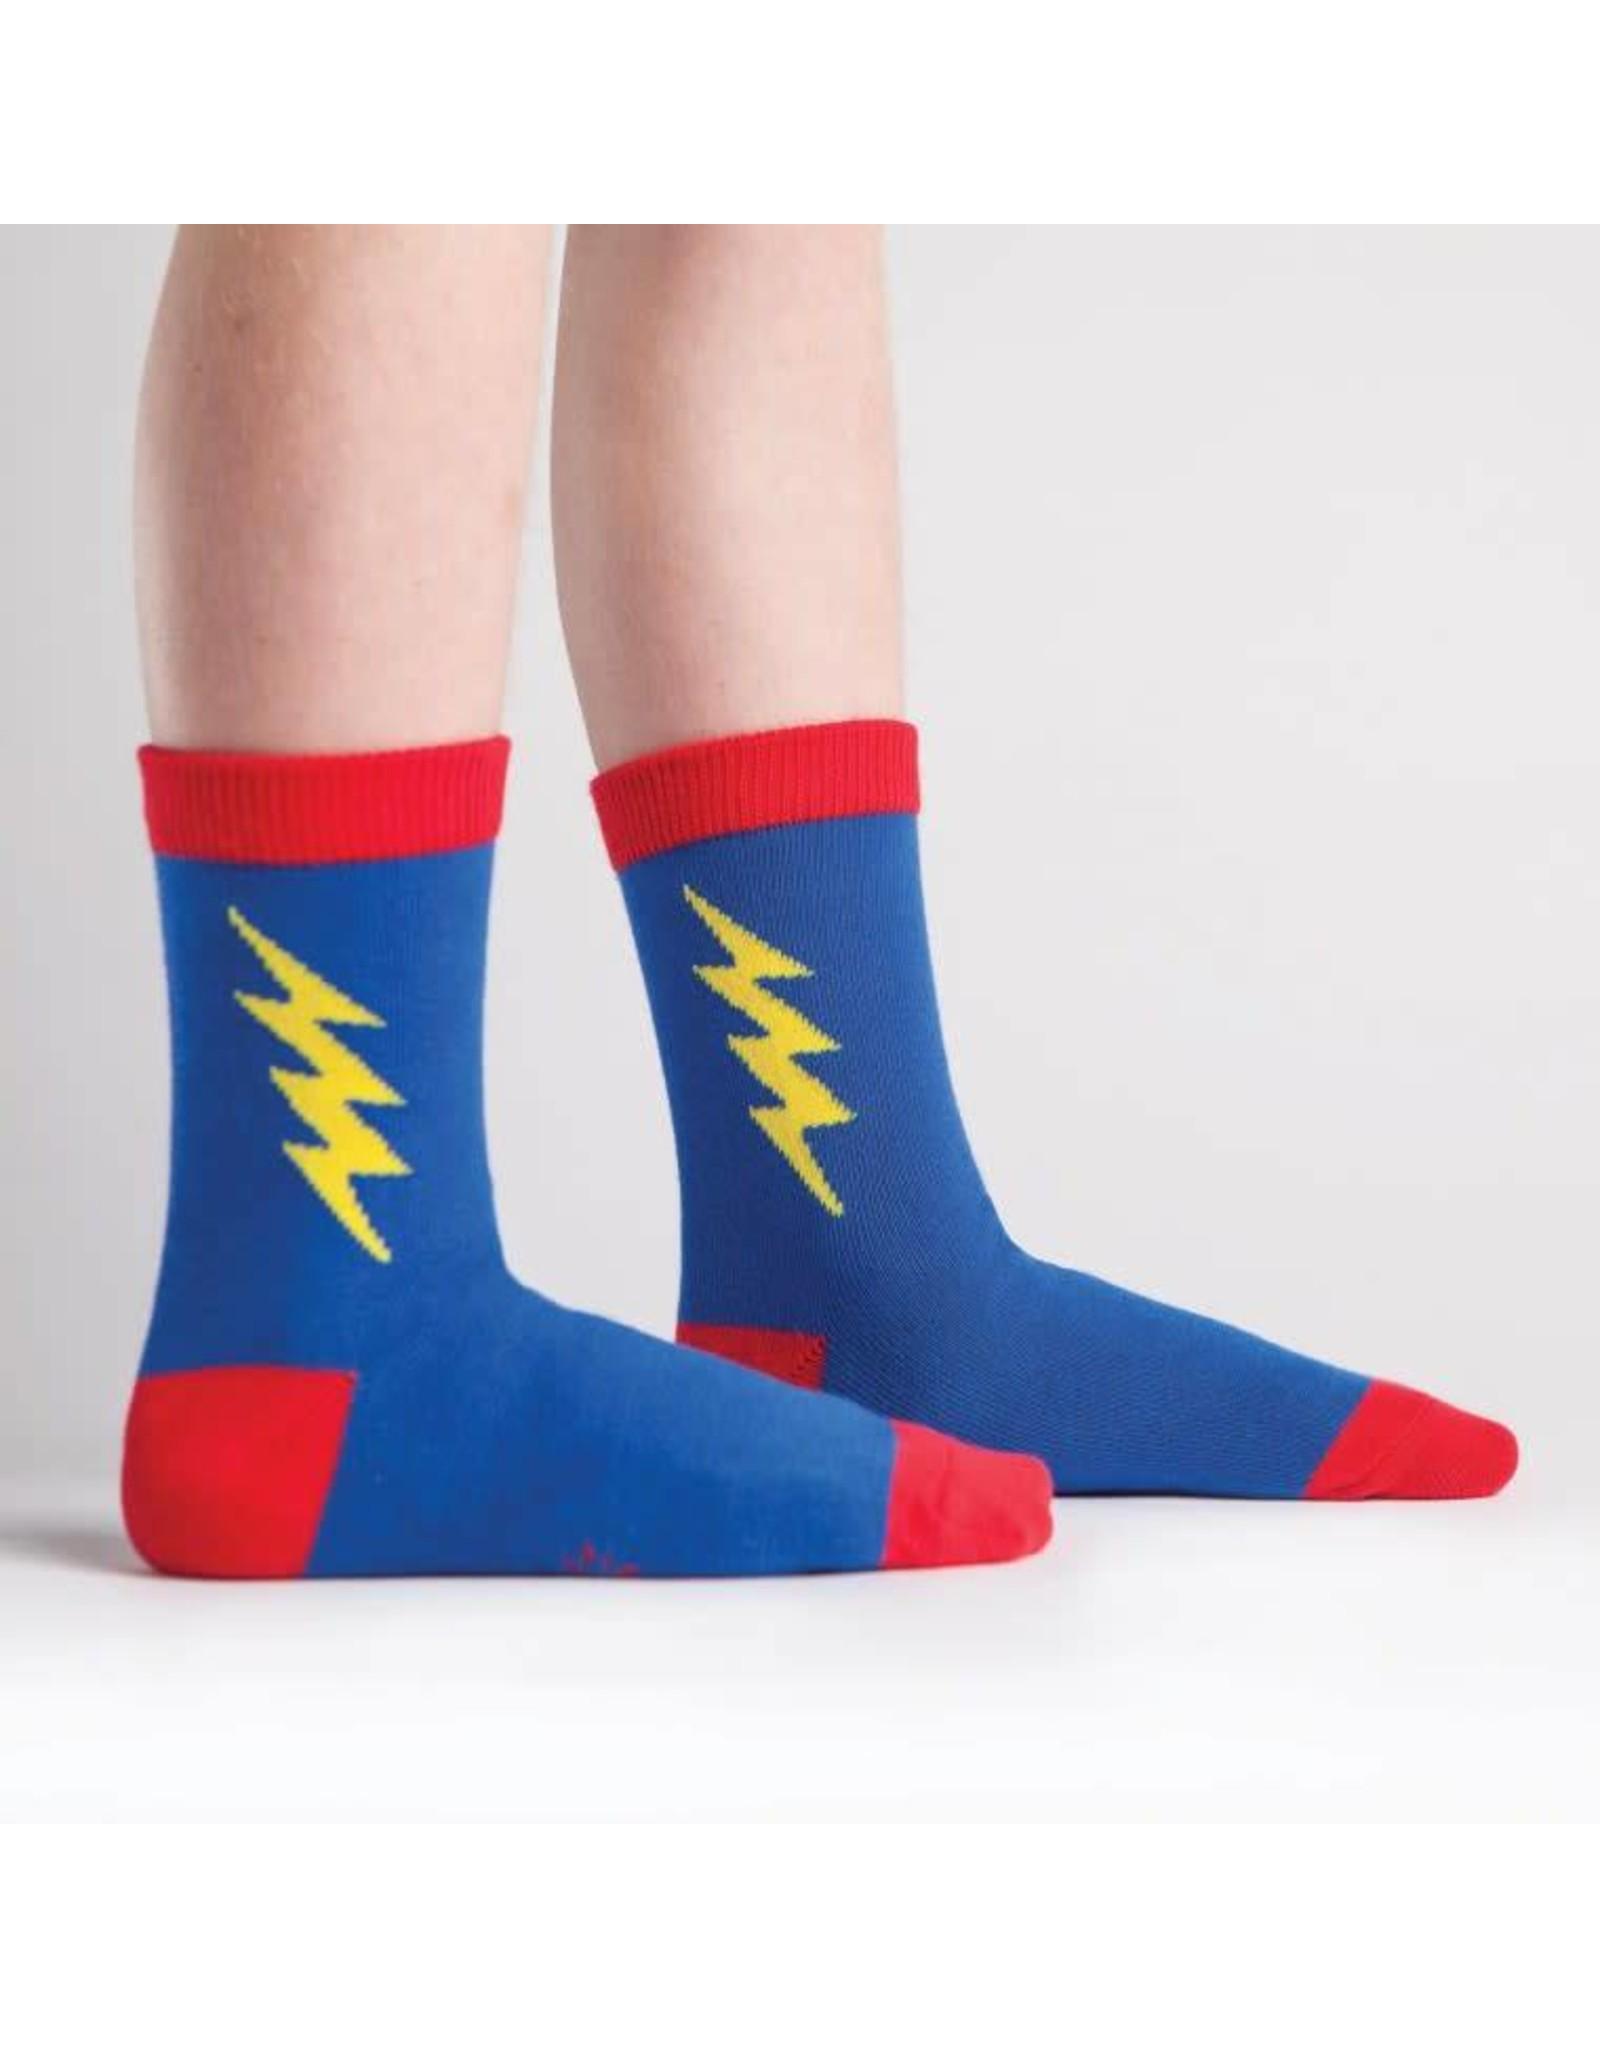 SOCK IT TO ME - Junior Super Hero! Blue/Yellow Crew Socks